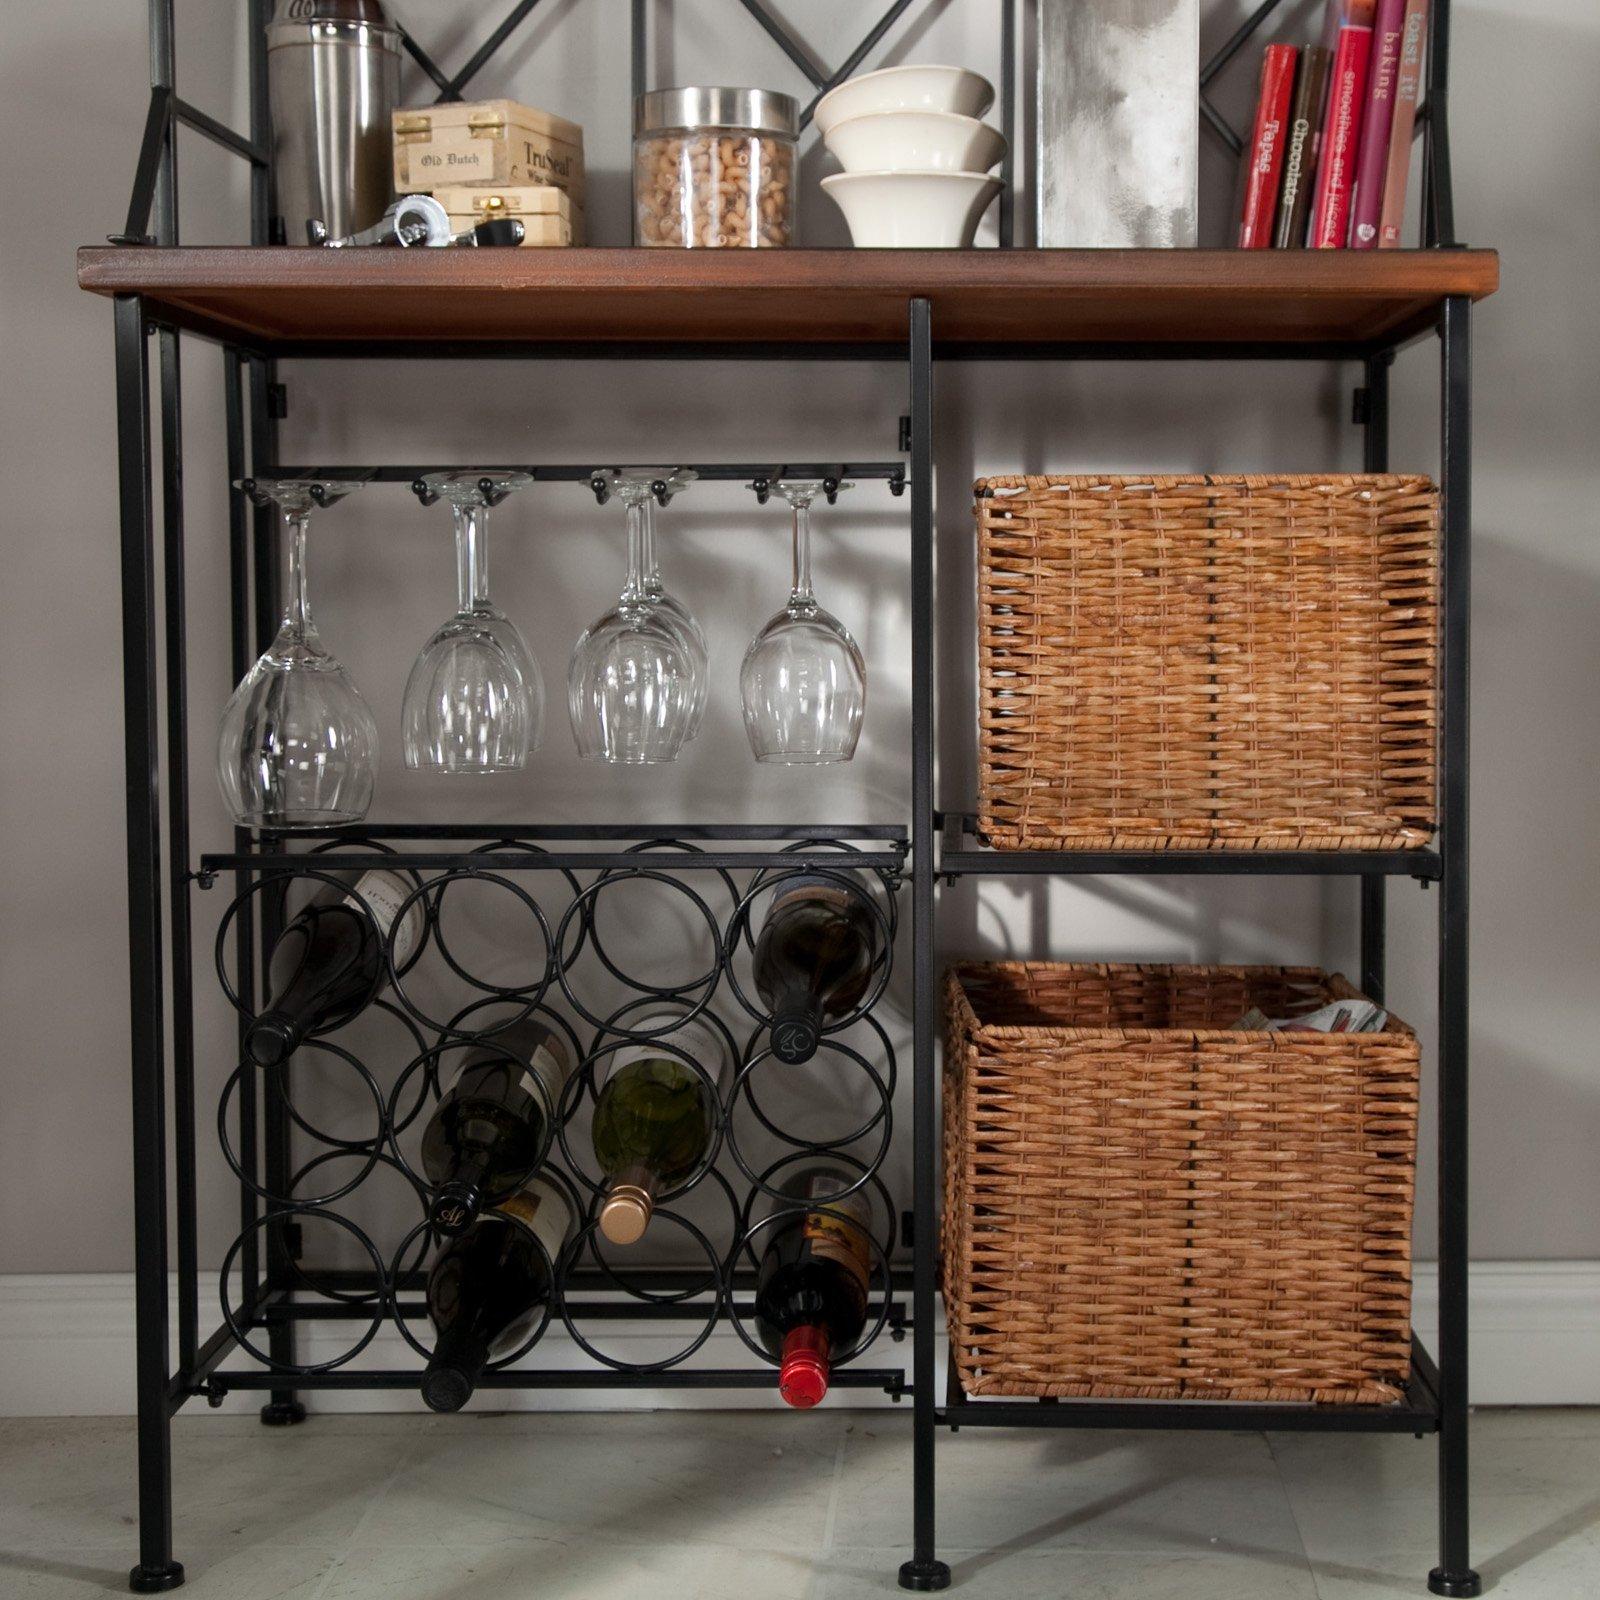 Belham Living Solano Bakers Rack with Baskets by Belham Living (Image #3)